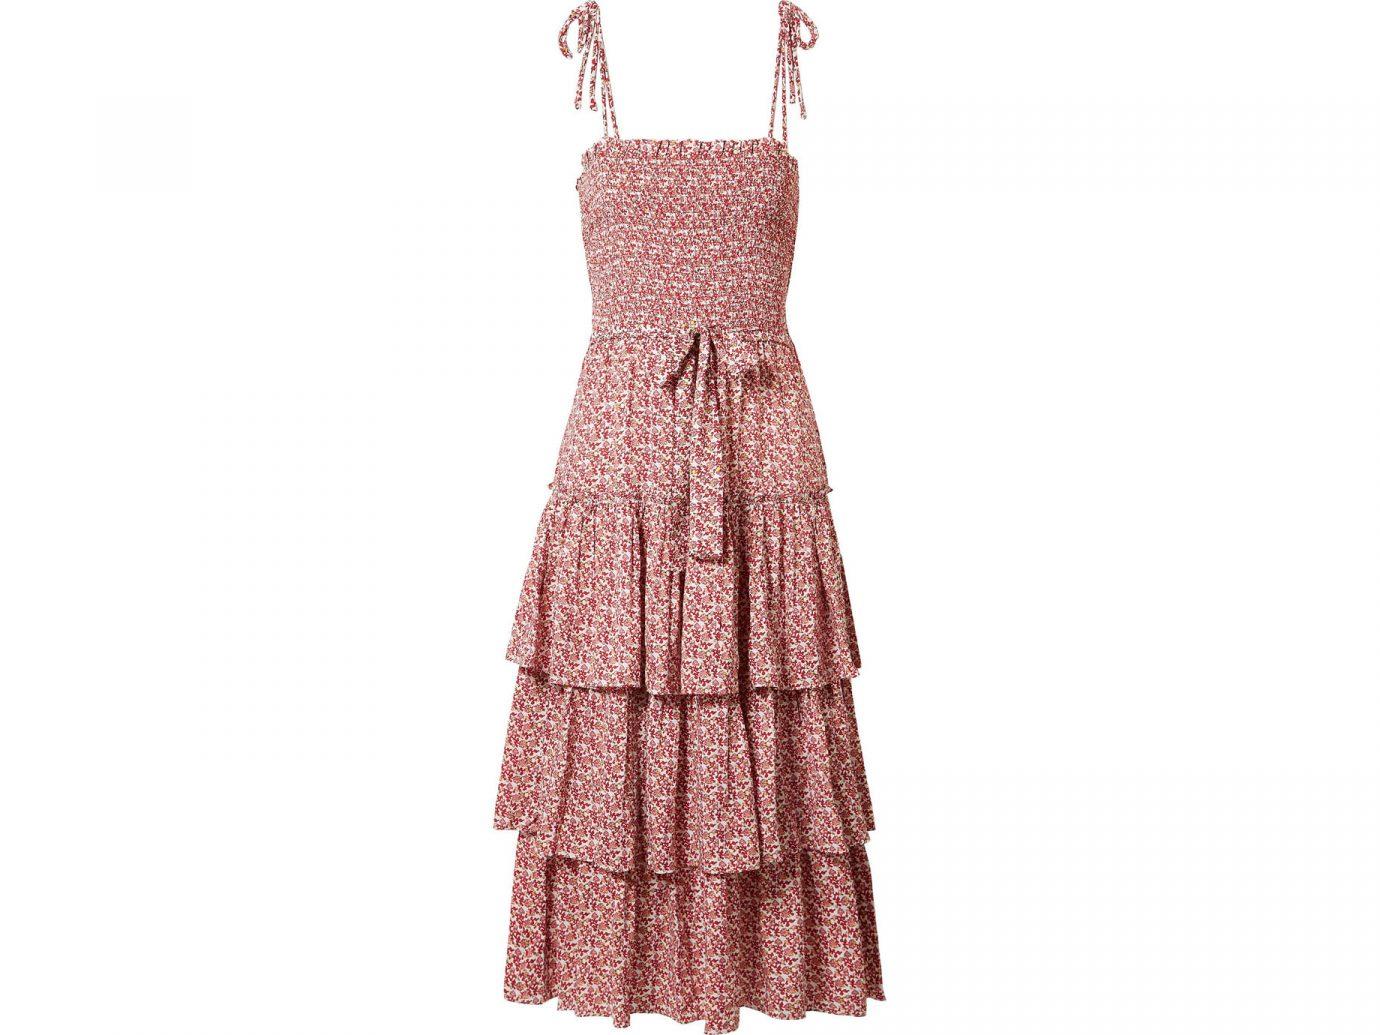 Tory Burch Ruffled smocked floral-print midi dress